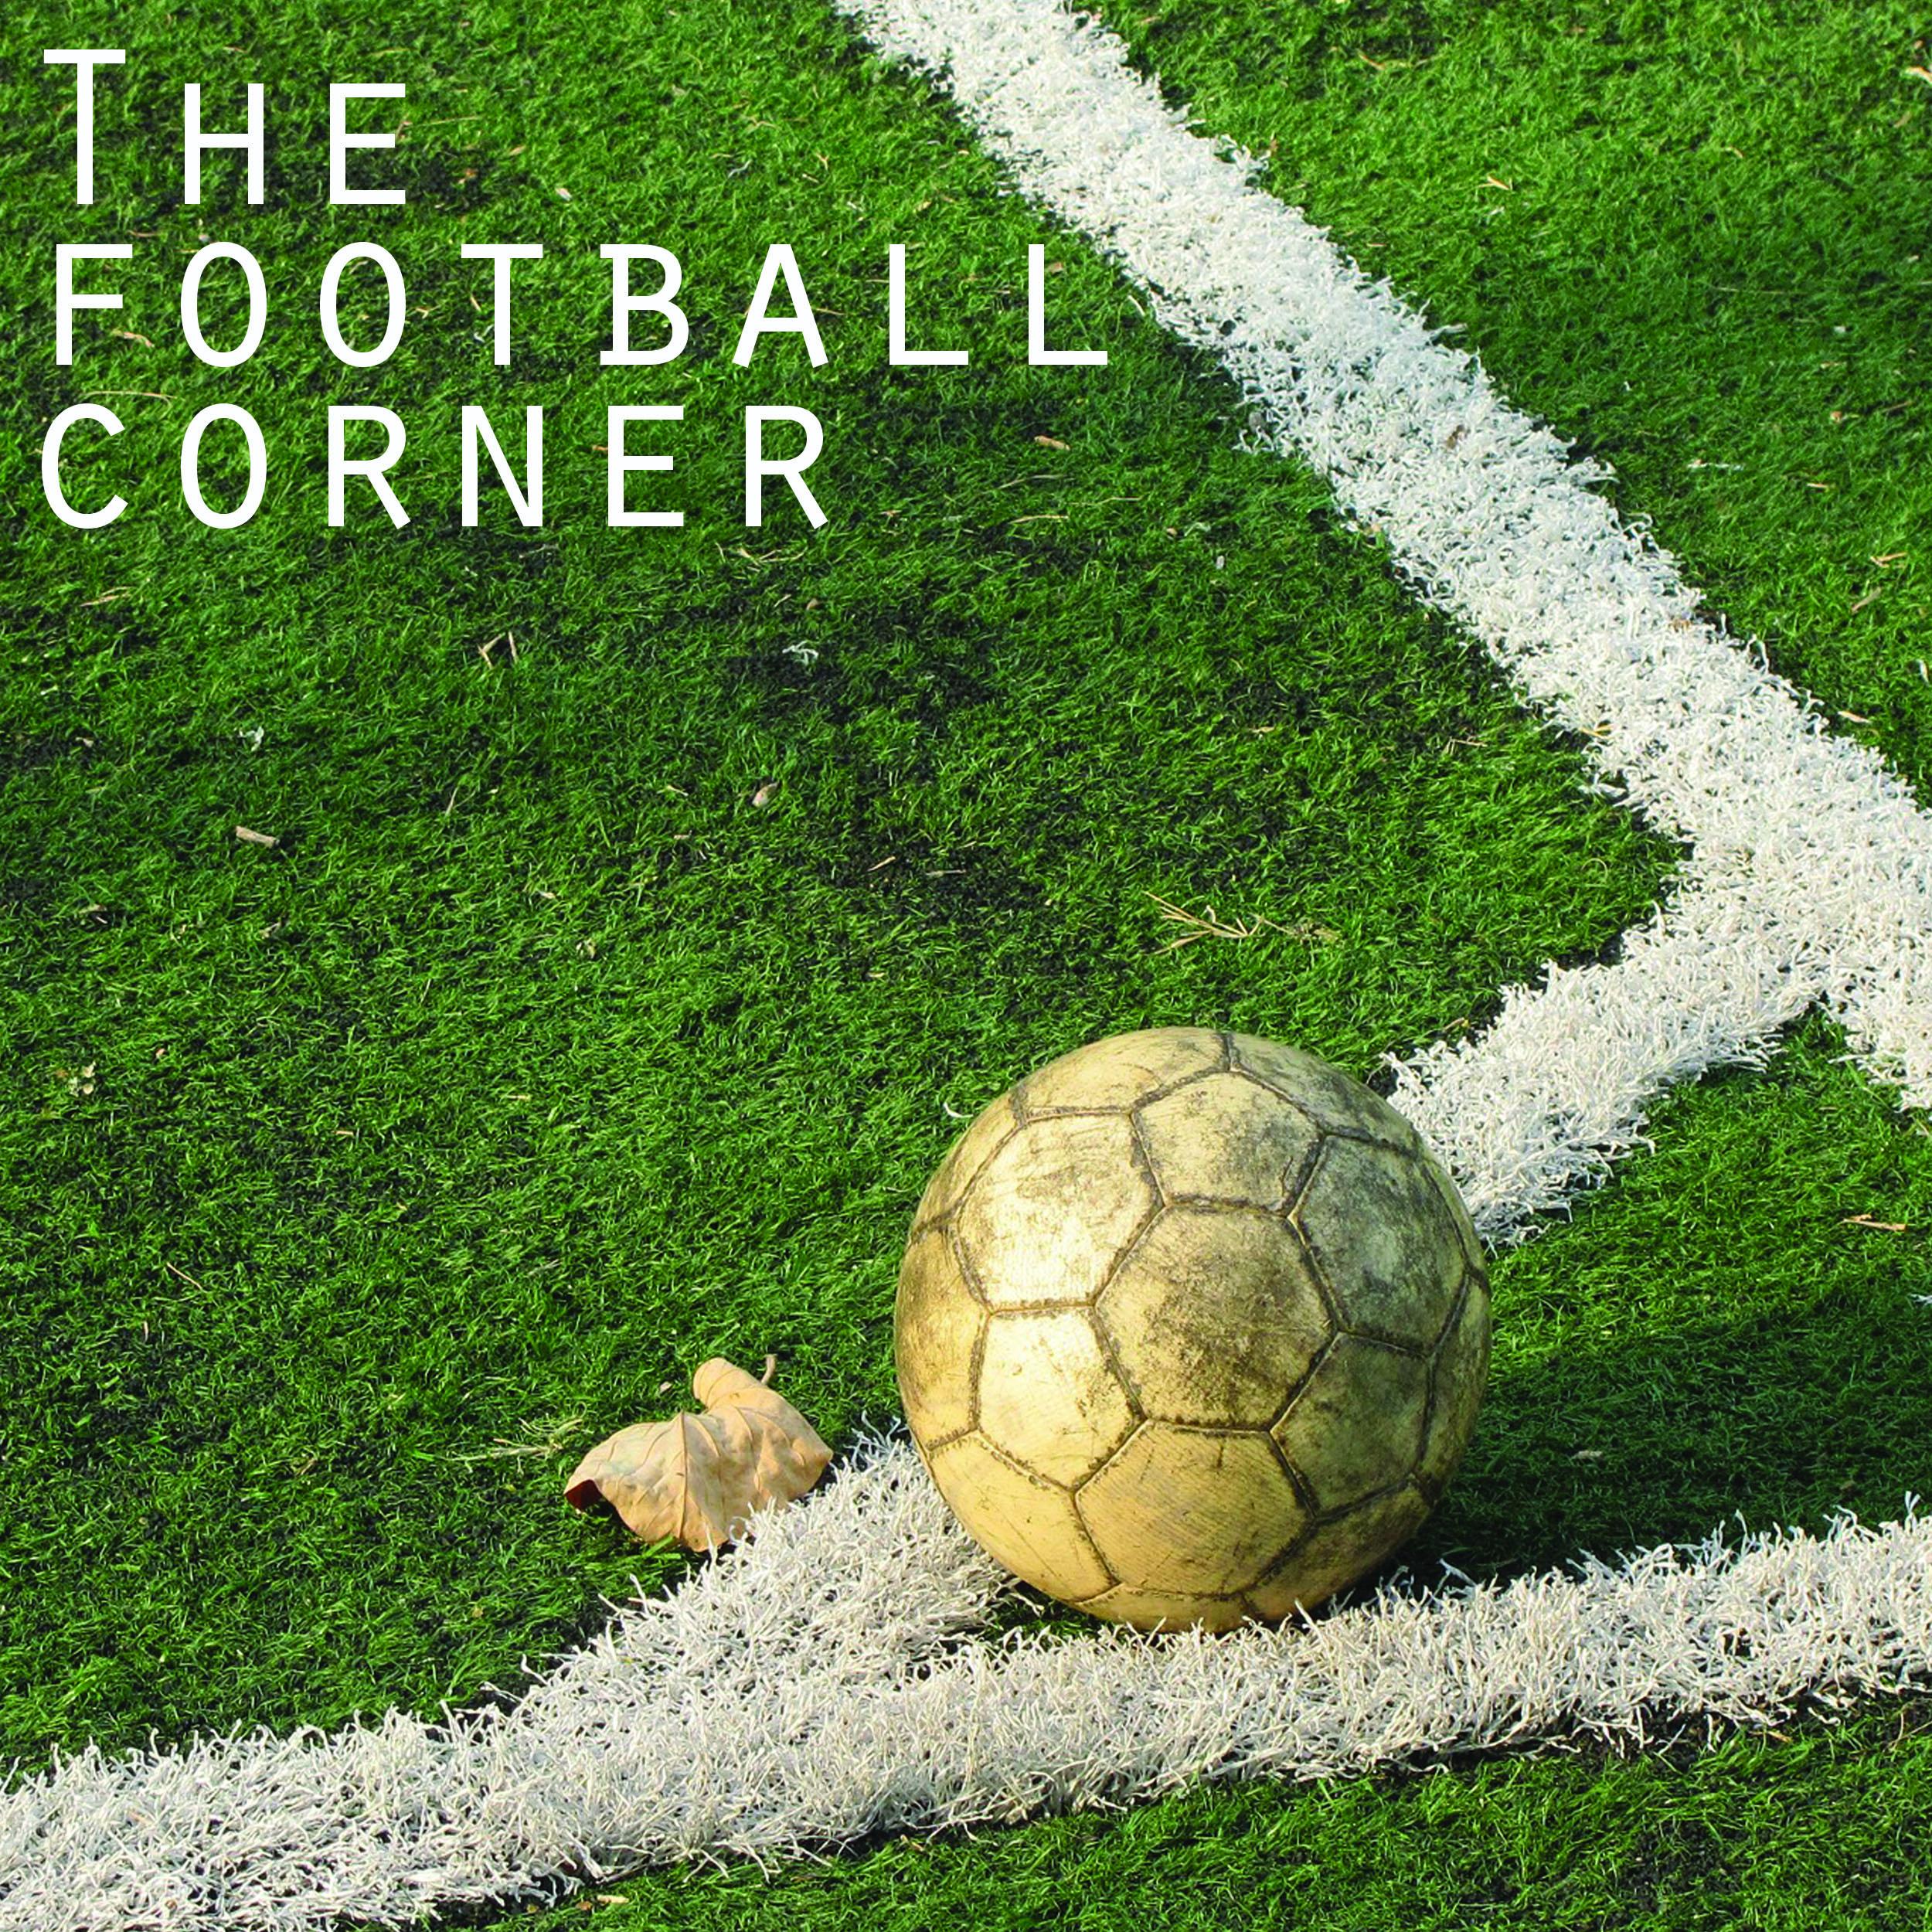 The Football Corner